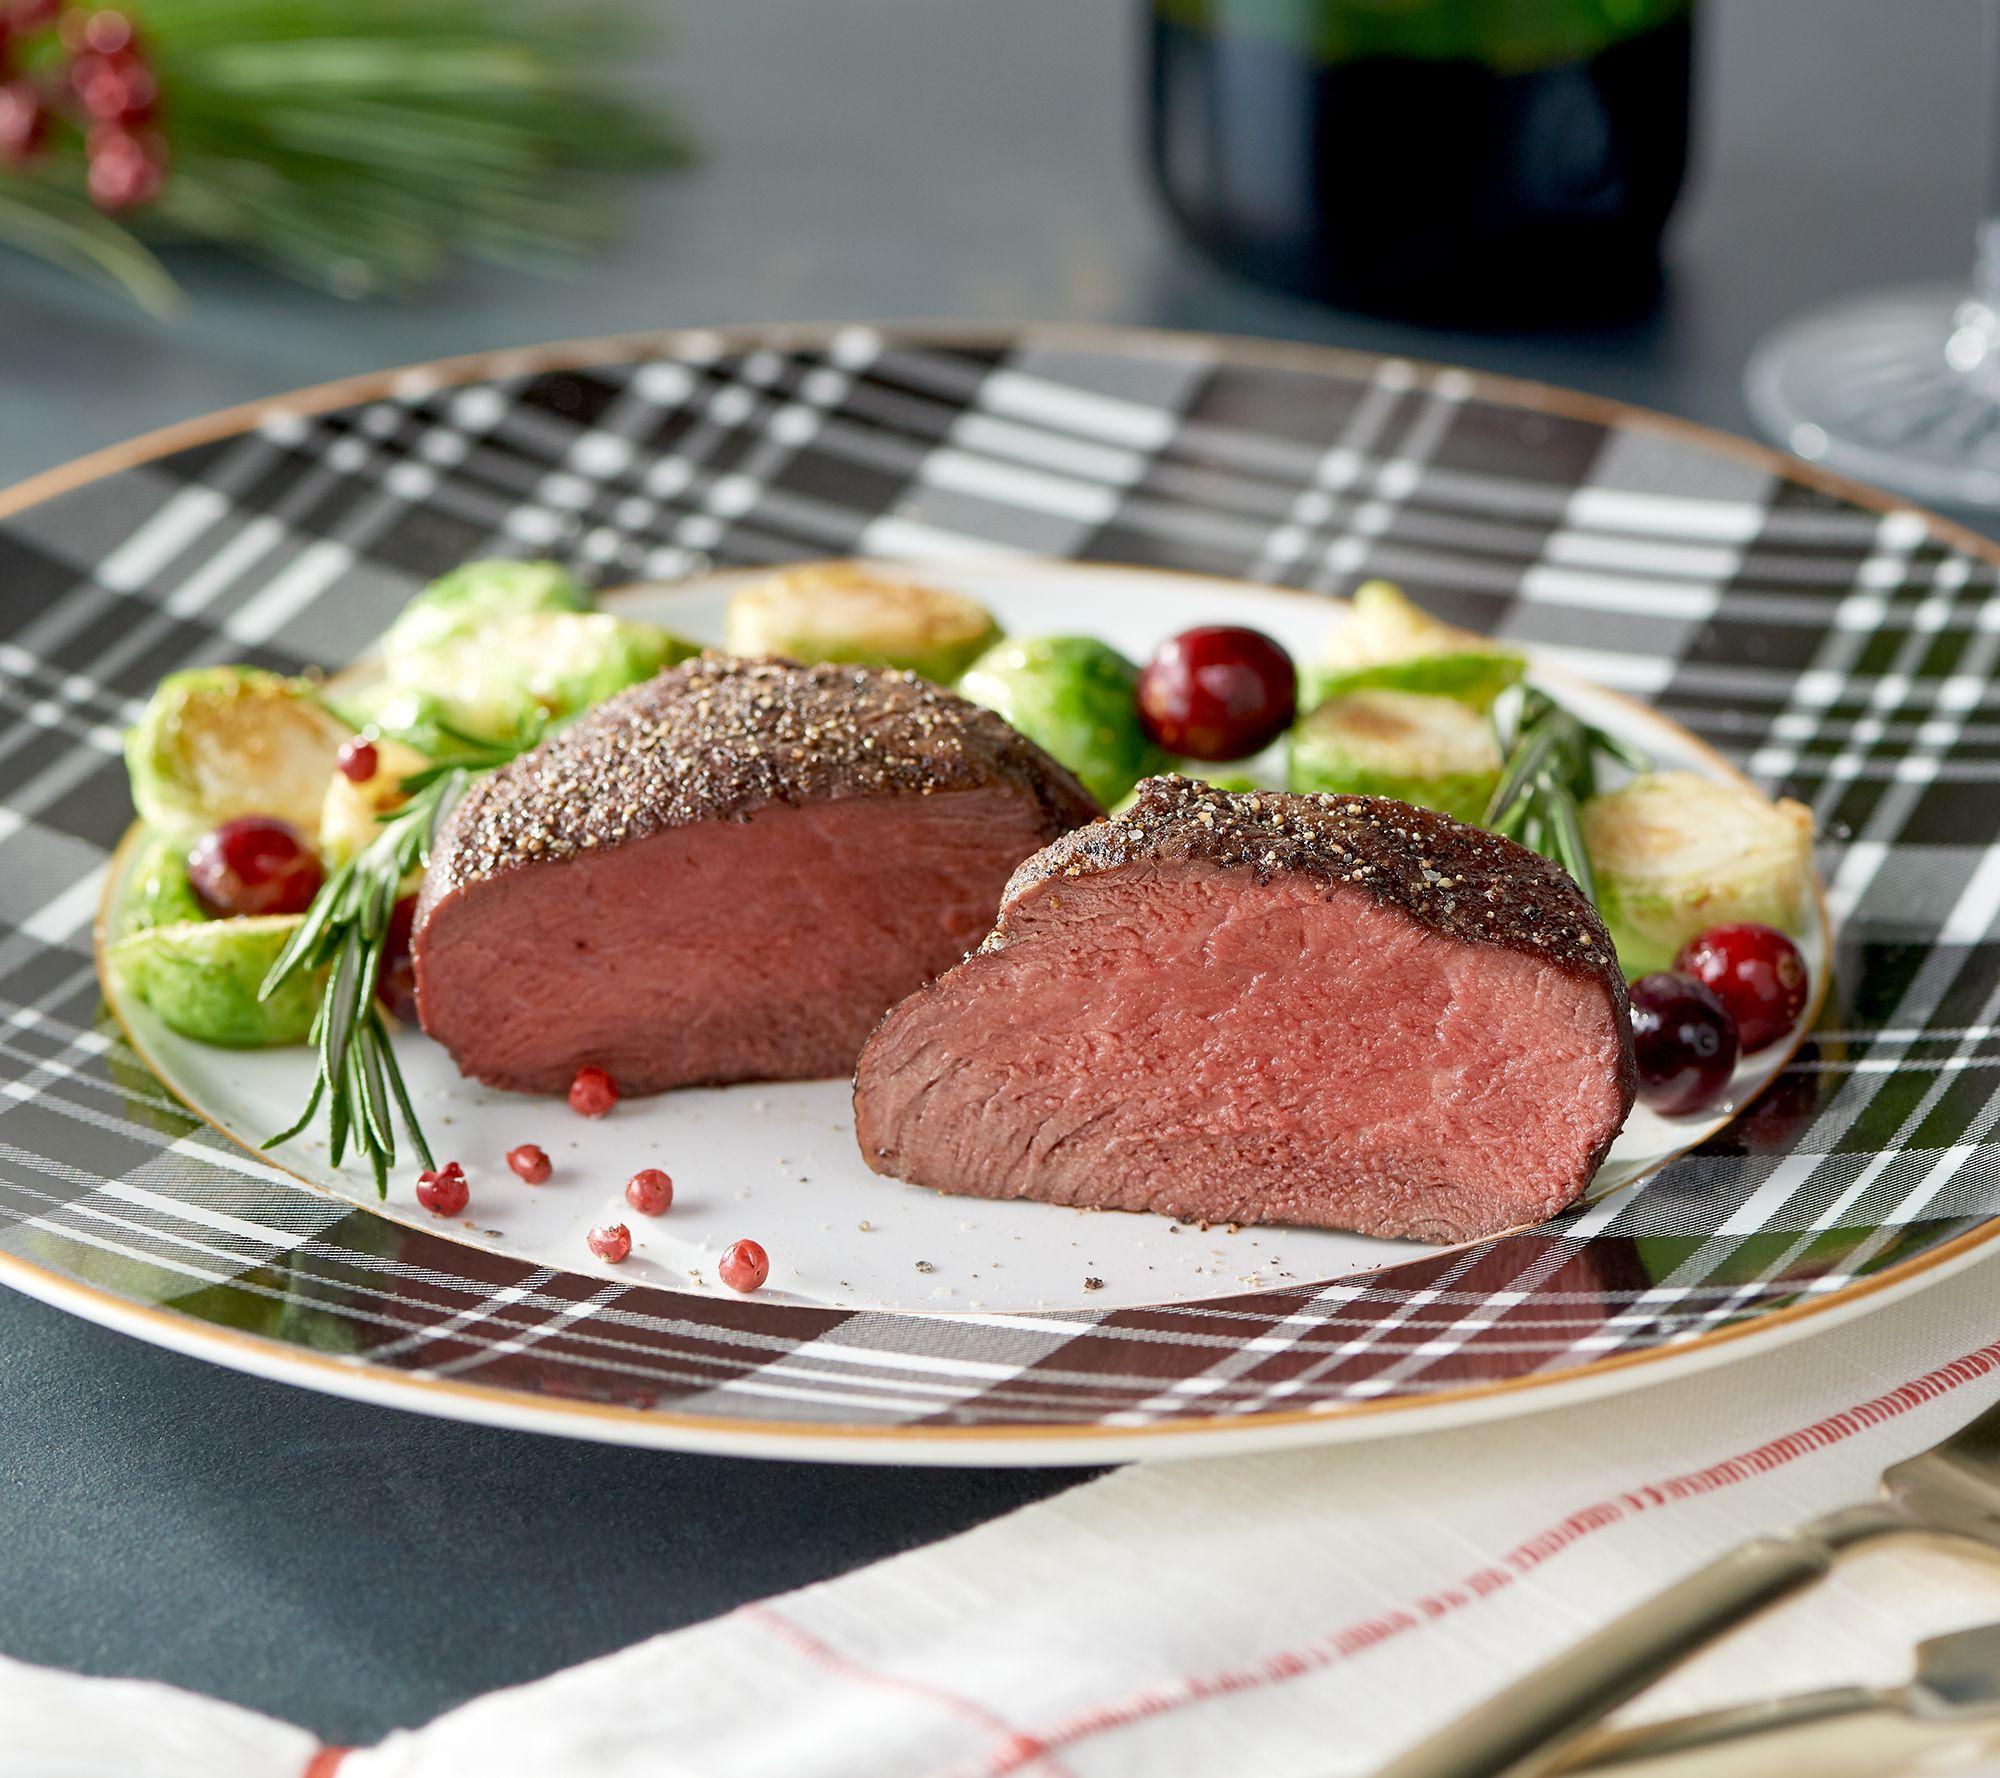 Receive ten 6-oz filet mignon steaks